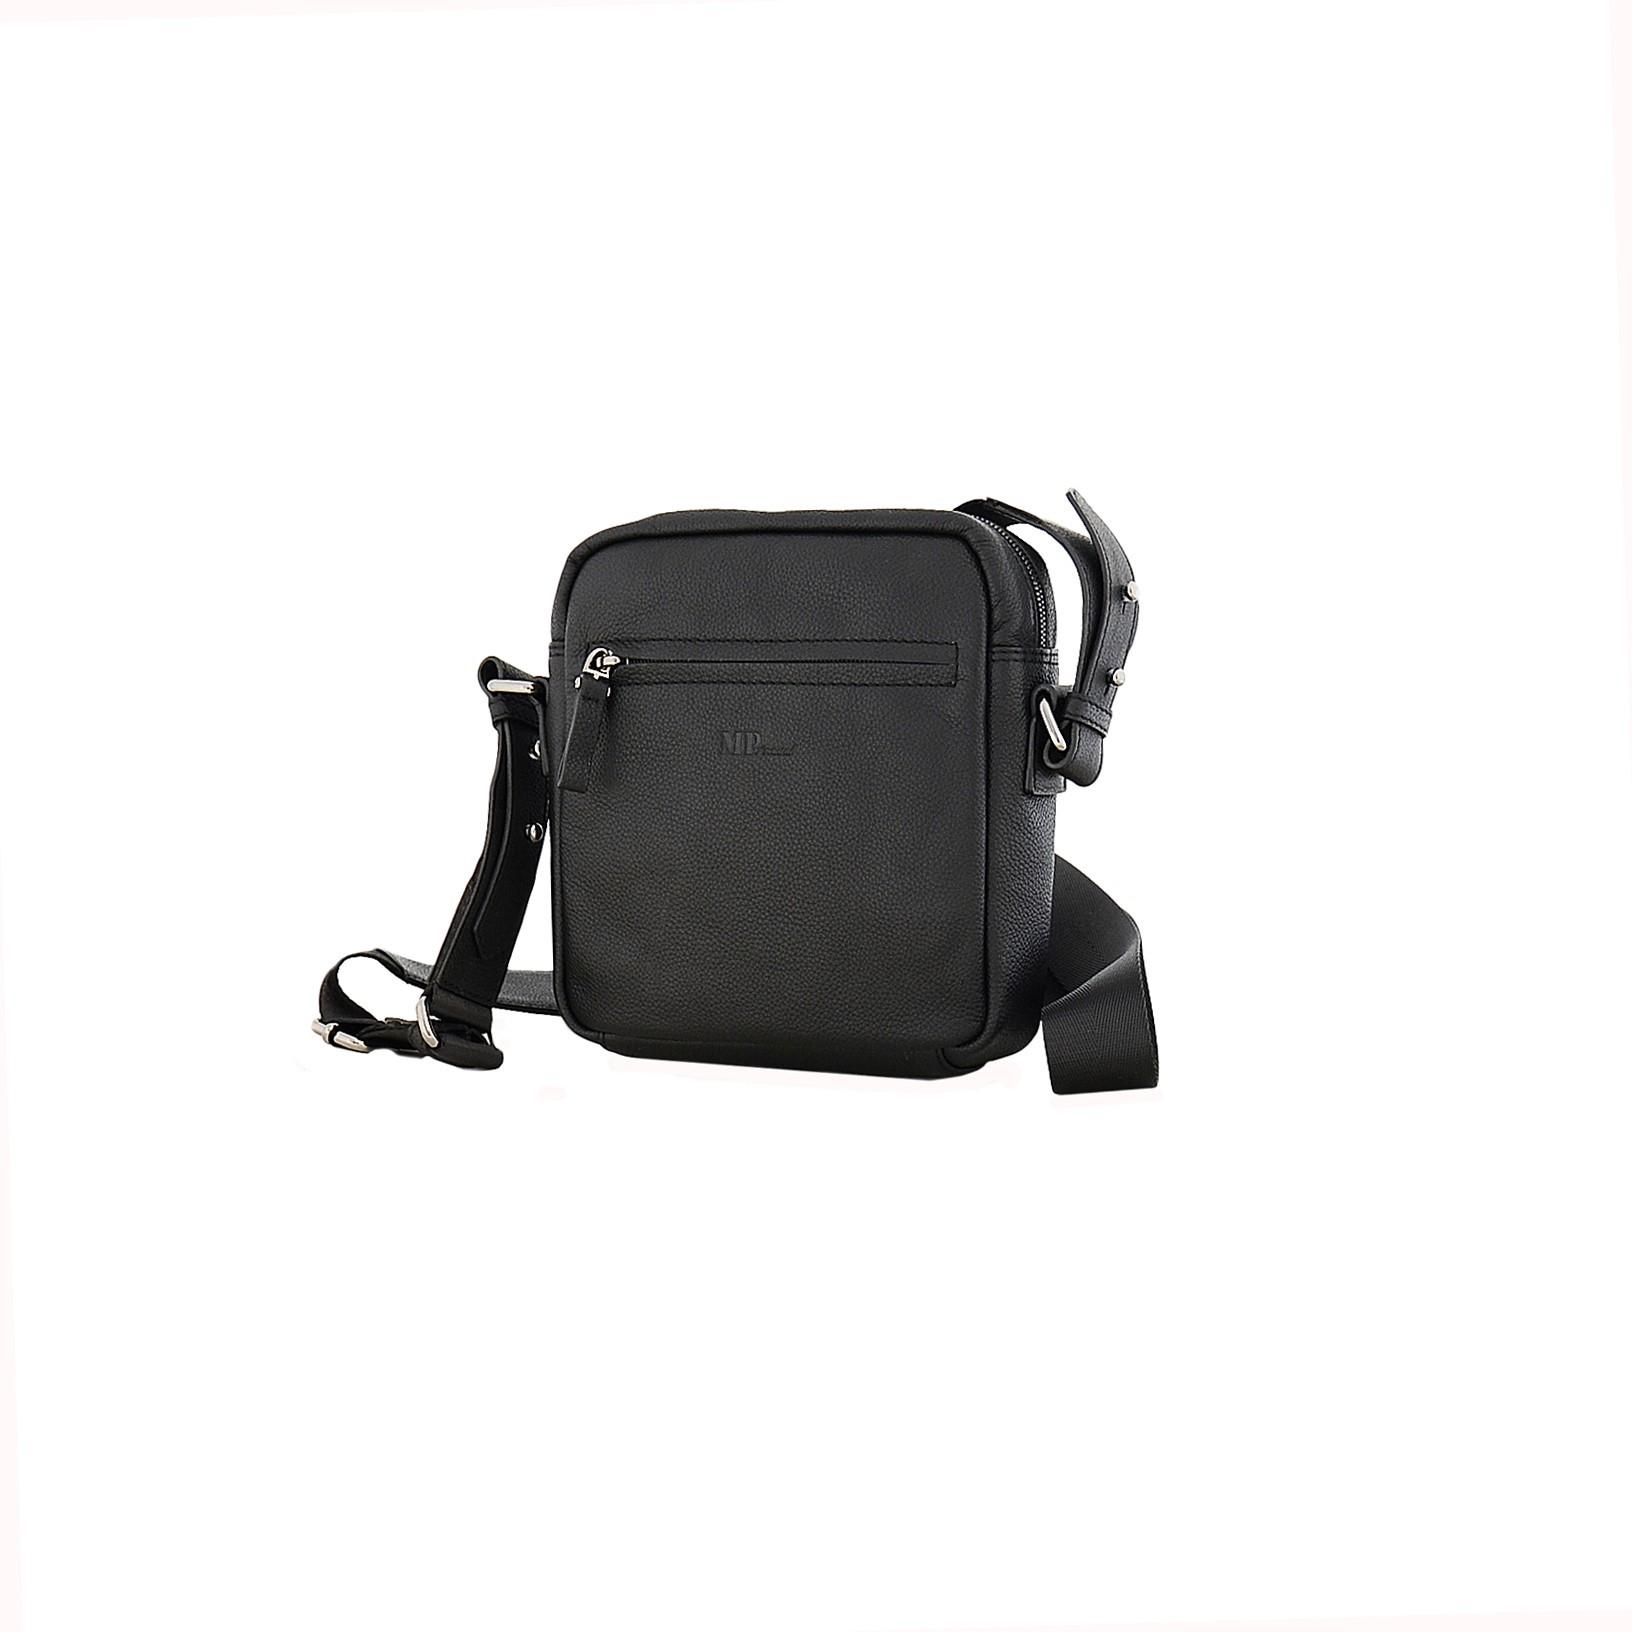 C800038 BLACK Сумка плечевая MP